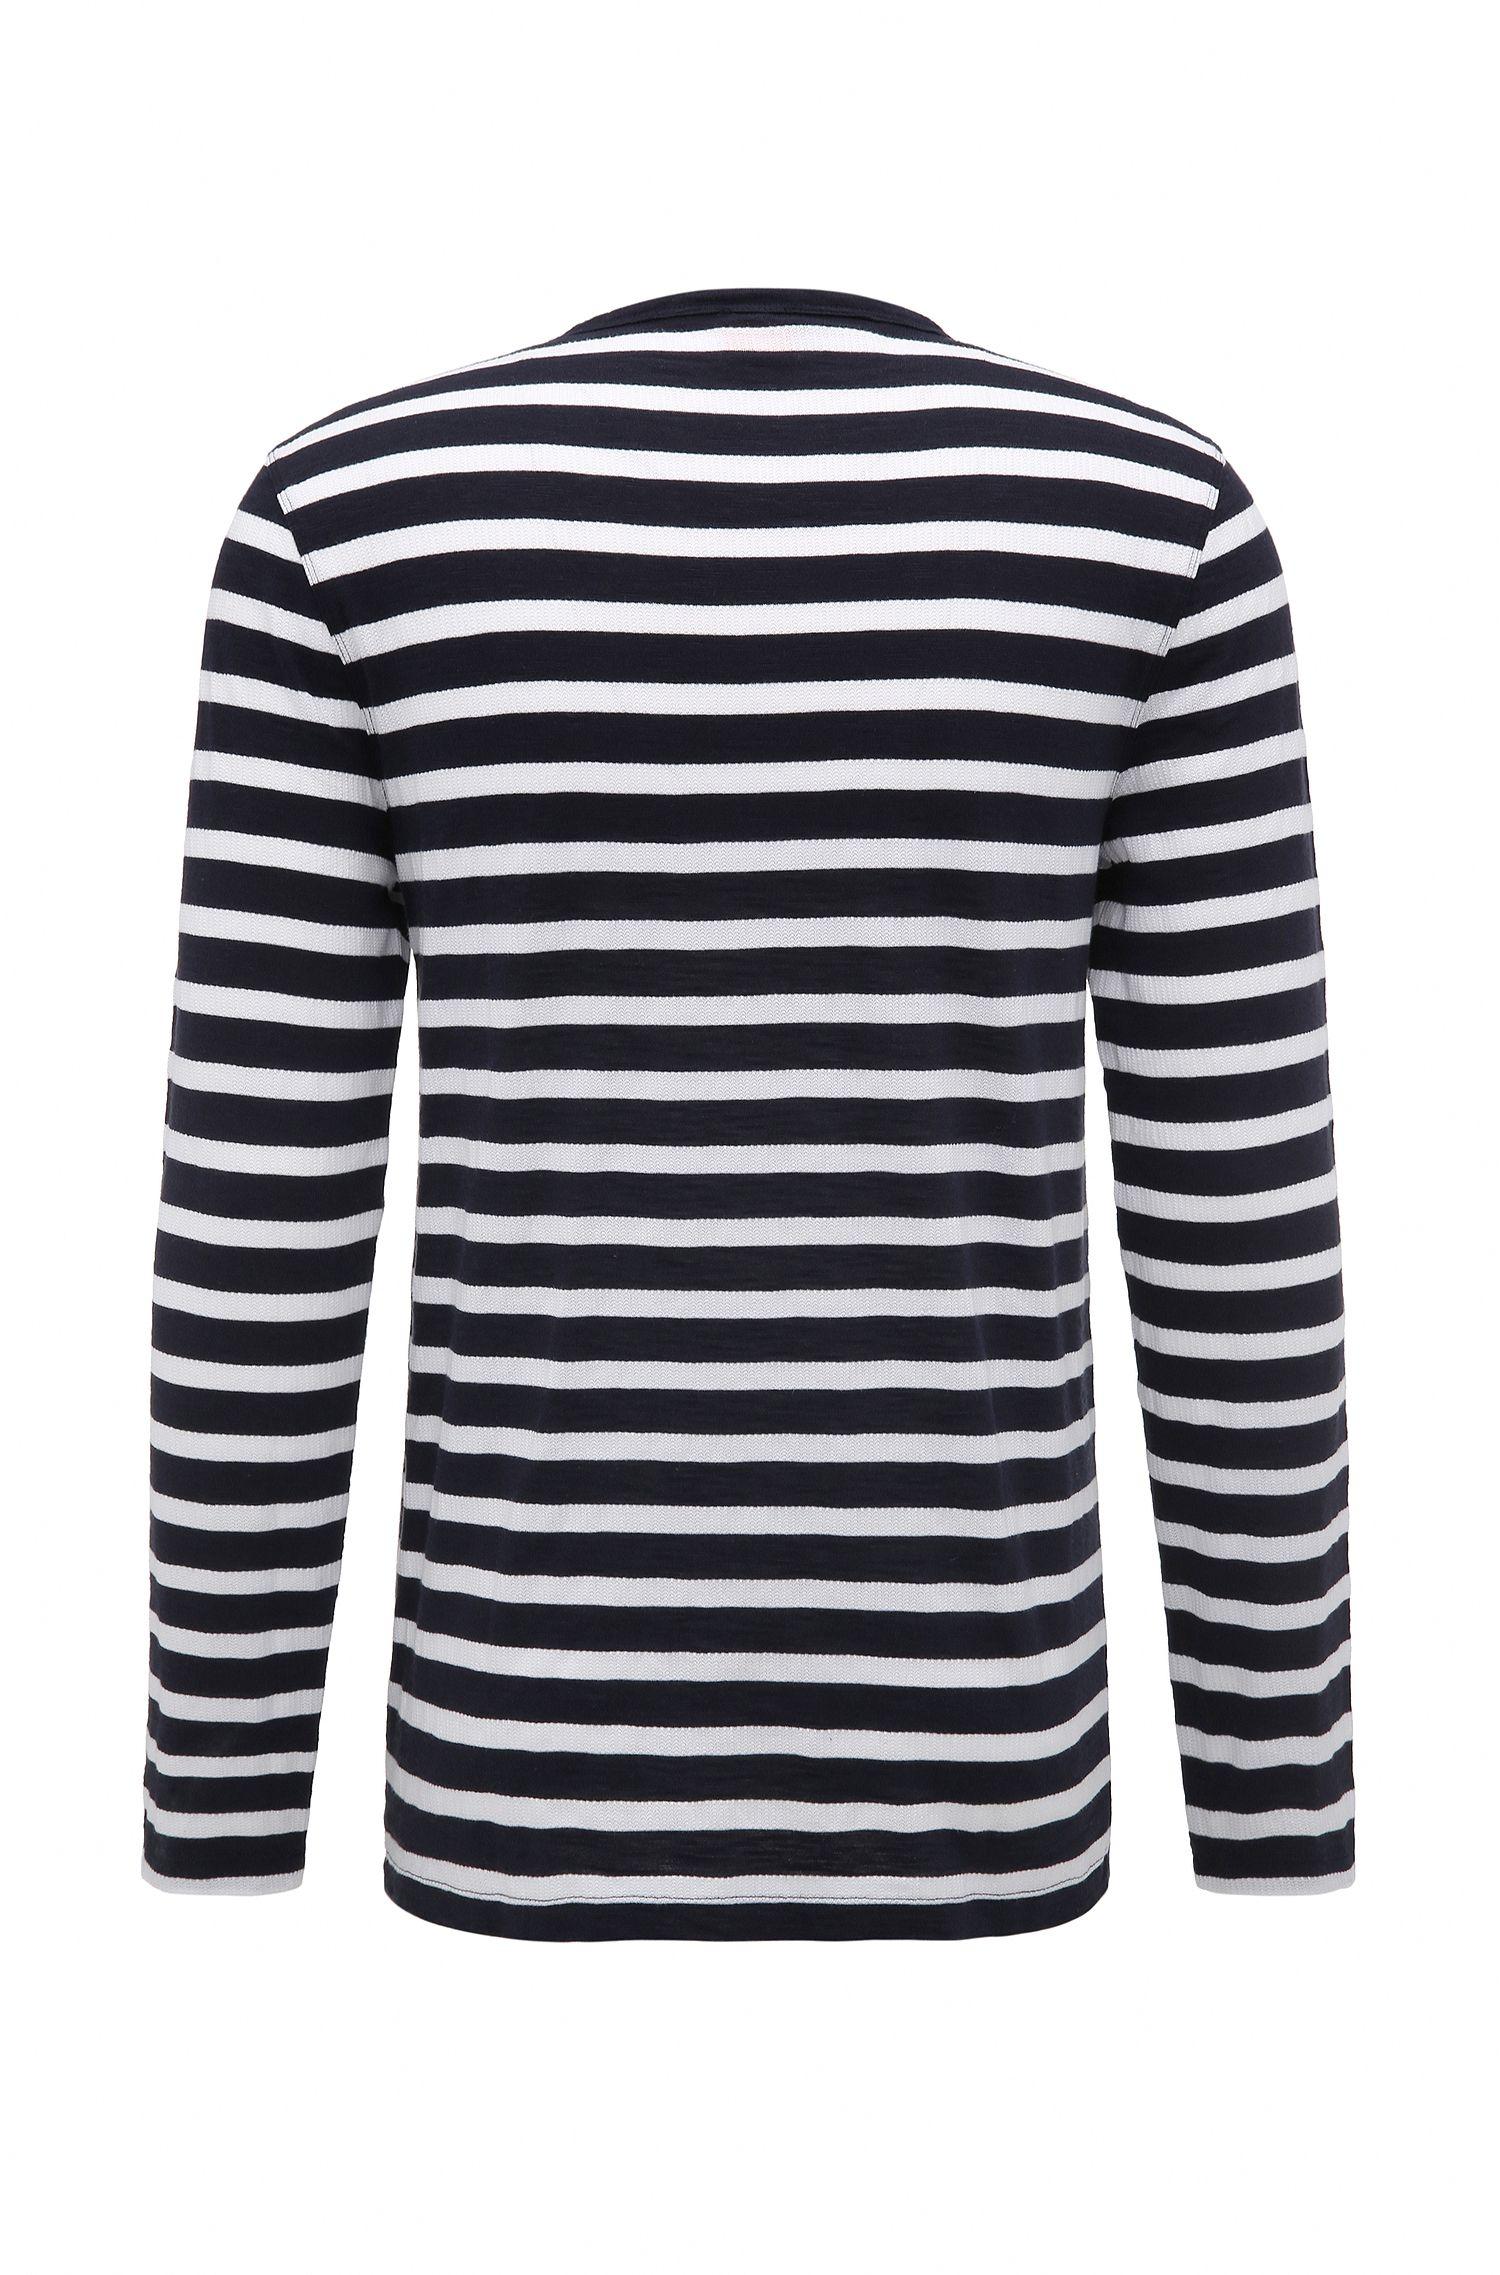 Striped Knit Henley Shirt | Translation, Dark Blue